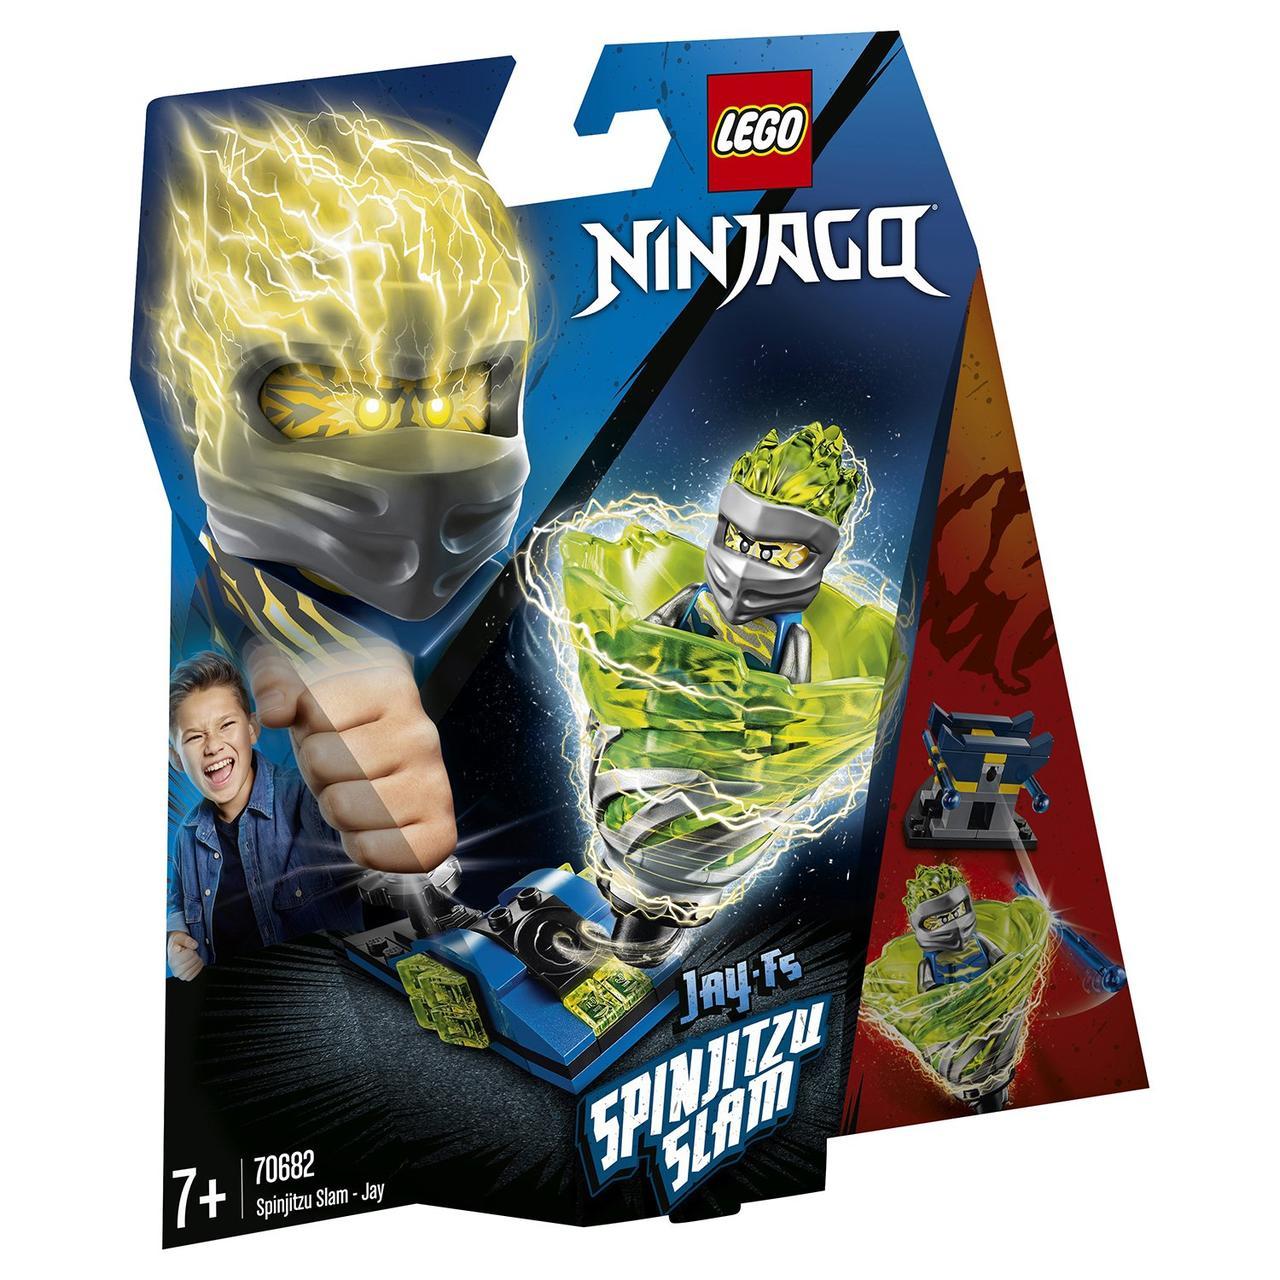 70682 Lego Ninjago Бой мастеров кружитцу — Джей, Лего Ниндзяго